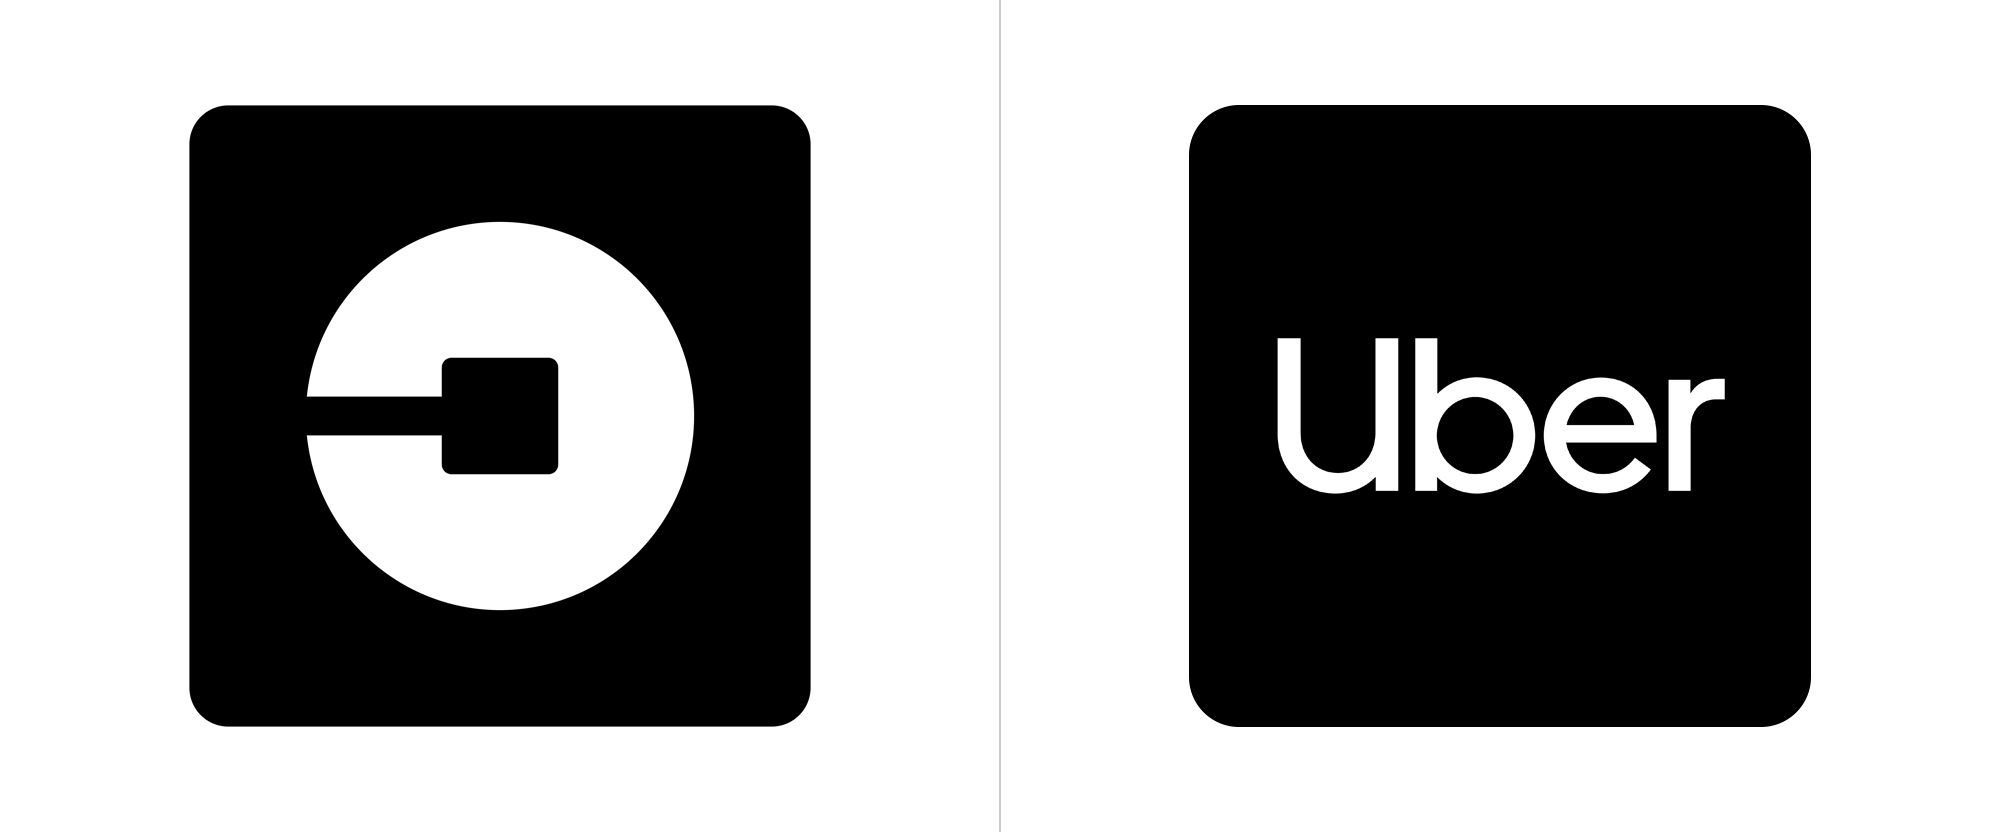 Uber changed brand logo